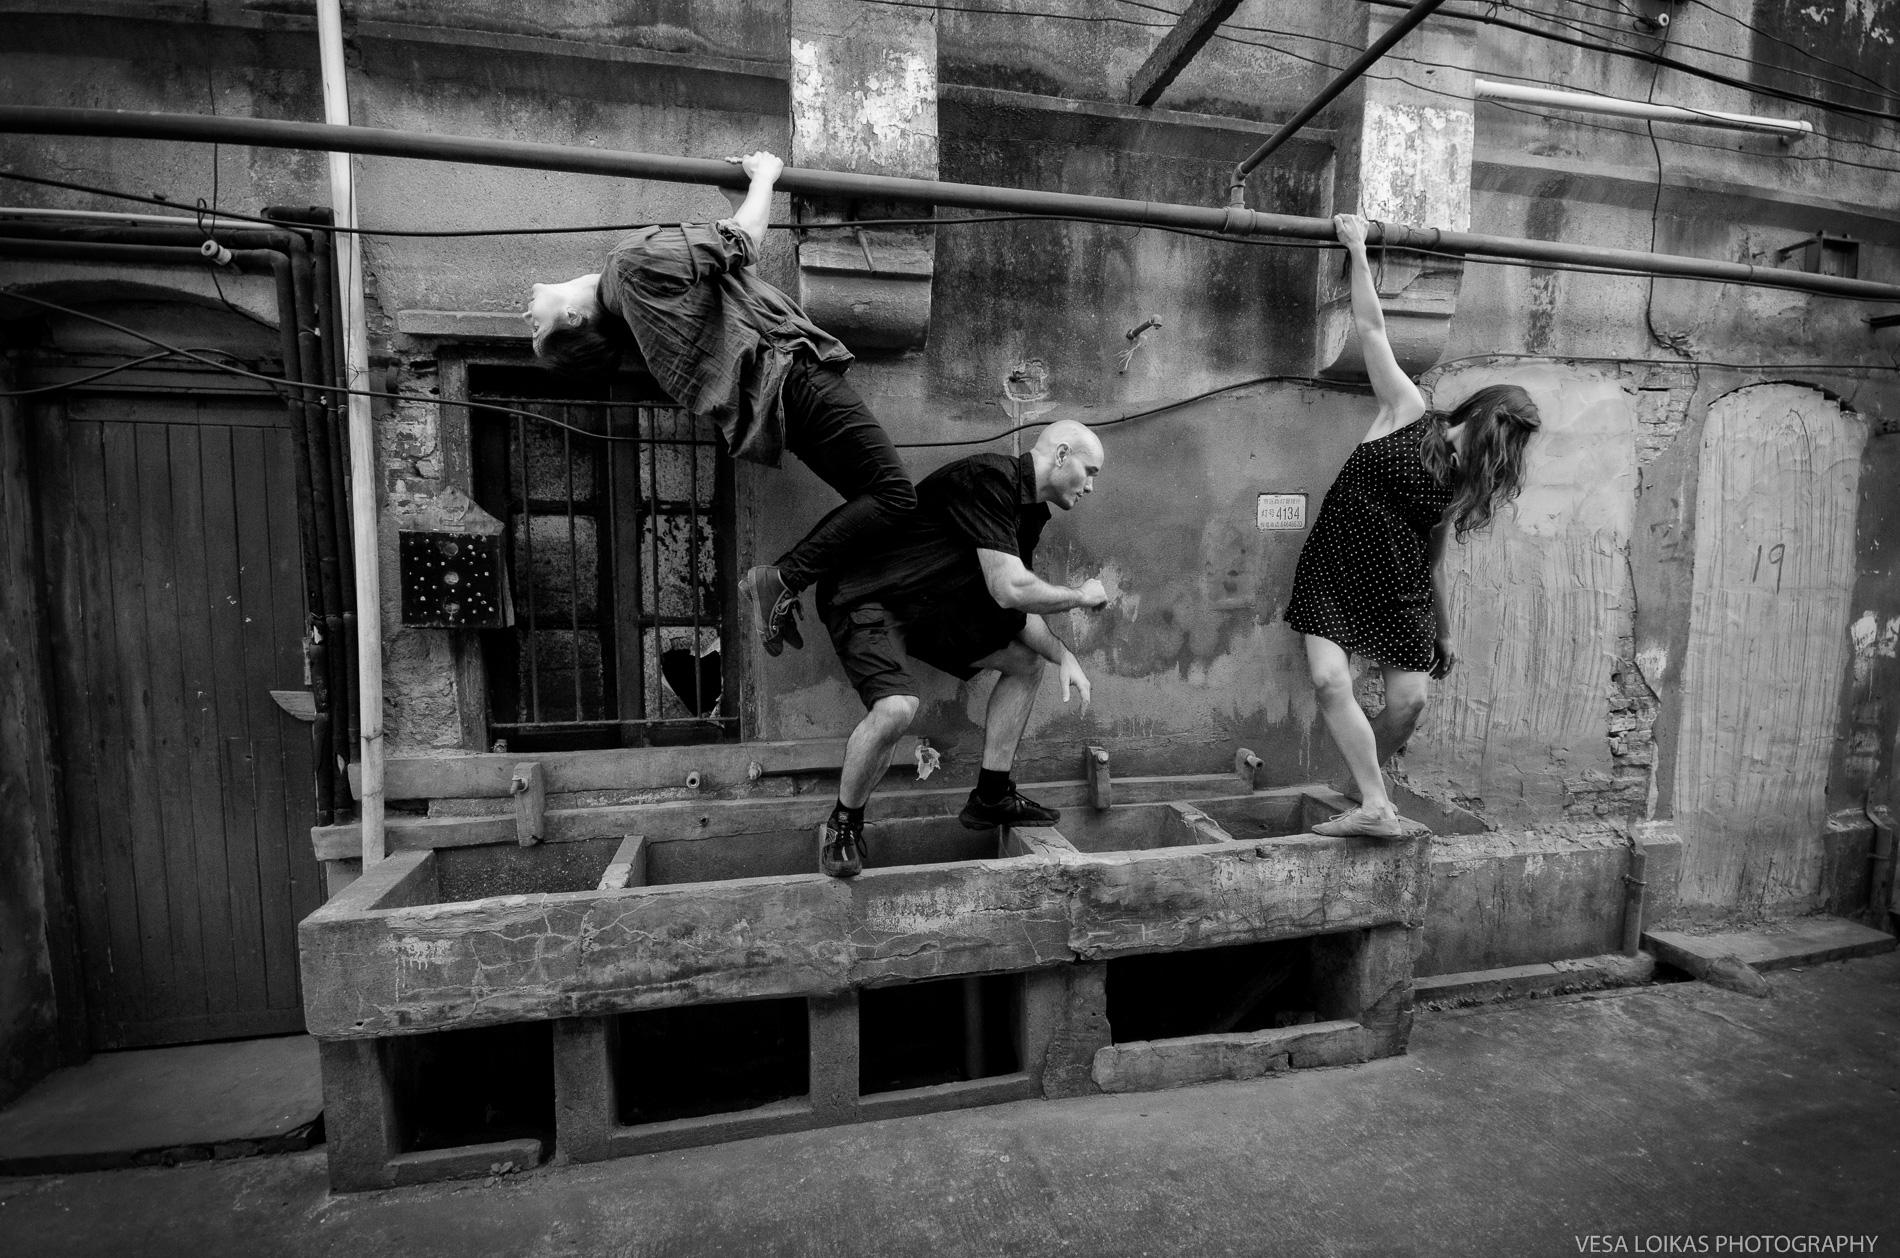 small_SET2_025_Concrete_Dreams_Shanghai_Oct_24_2014_Vesa_Loikas_Photography.jpg